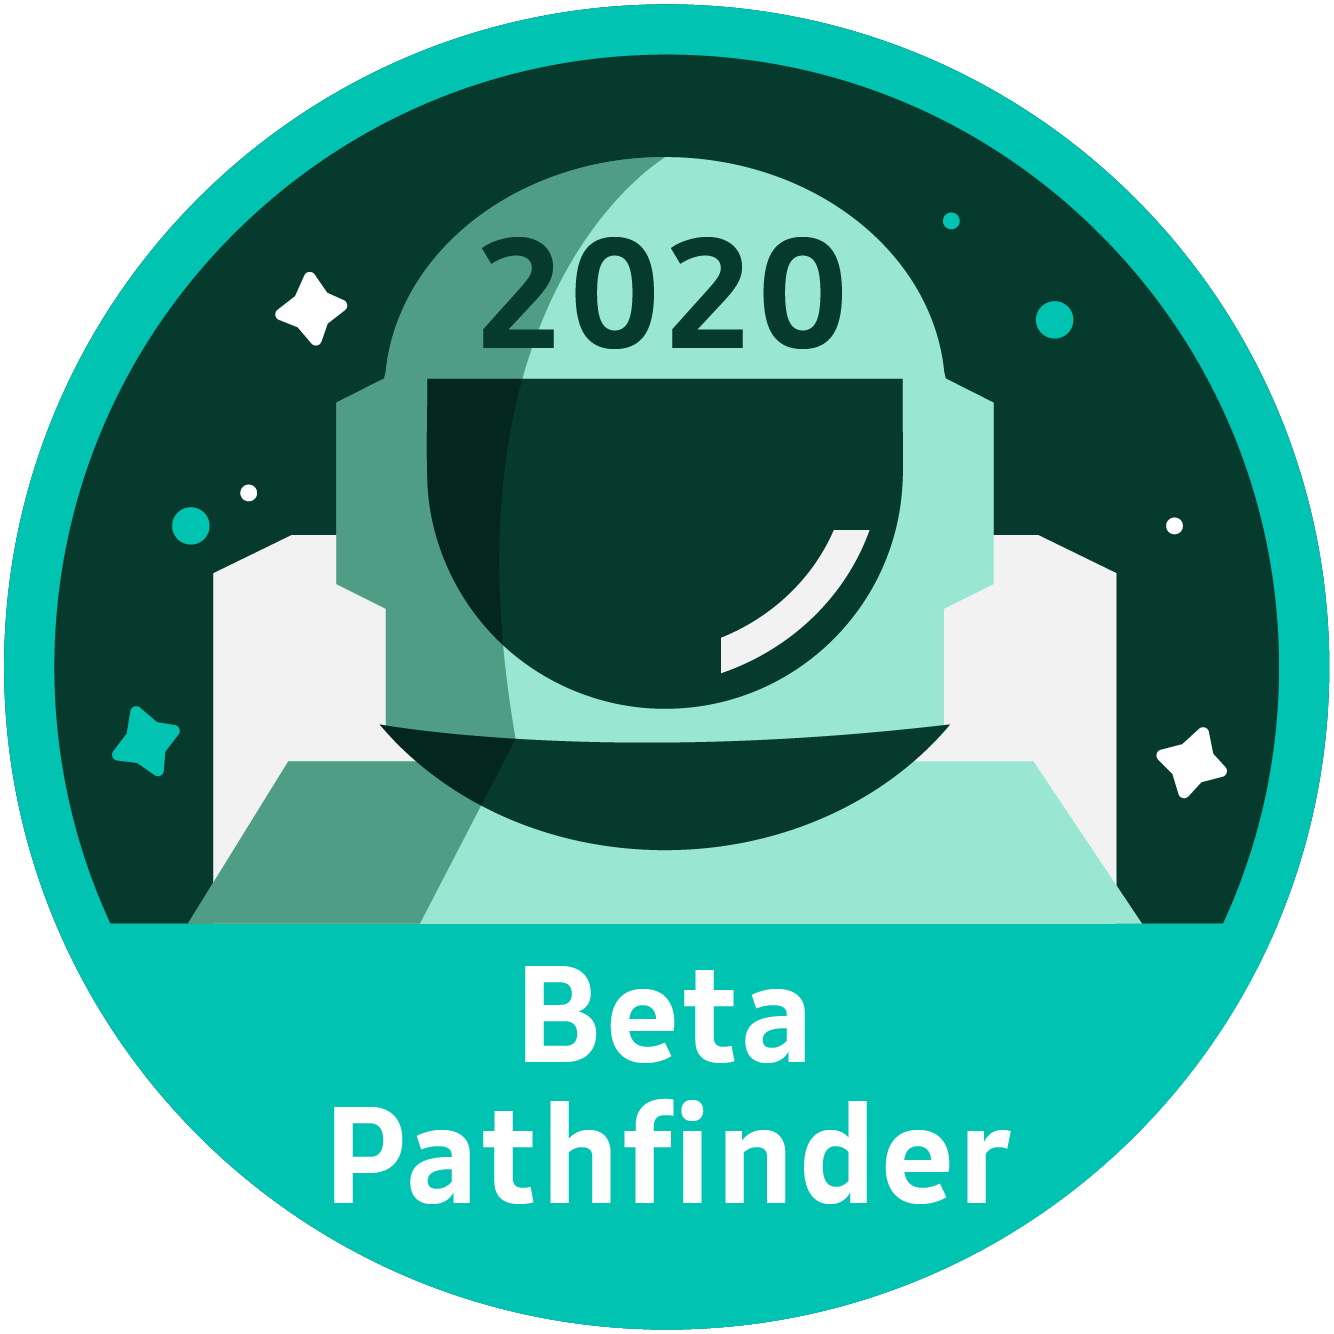 Beta Pathfinder 2020